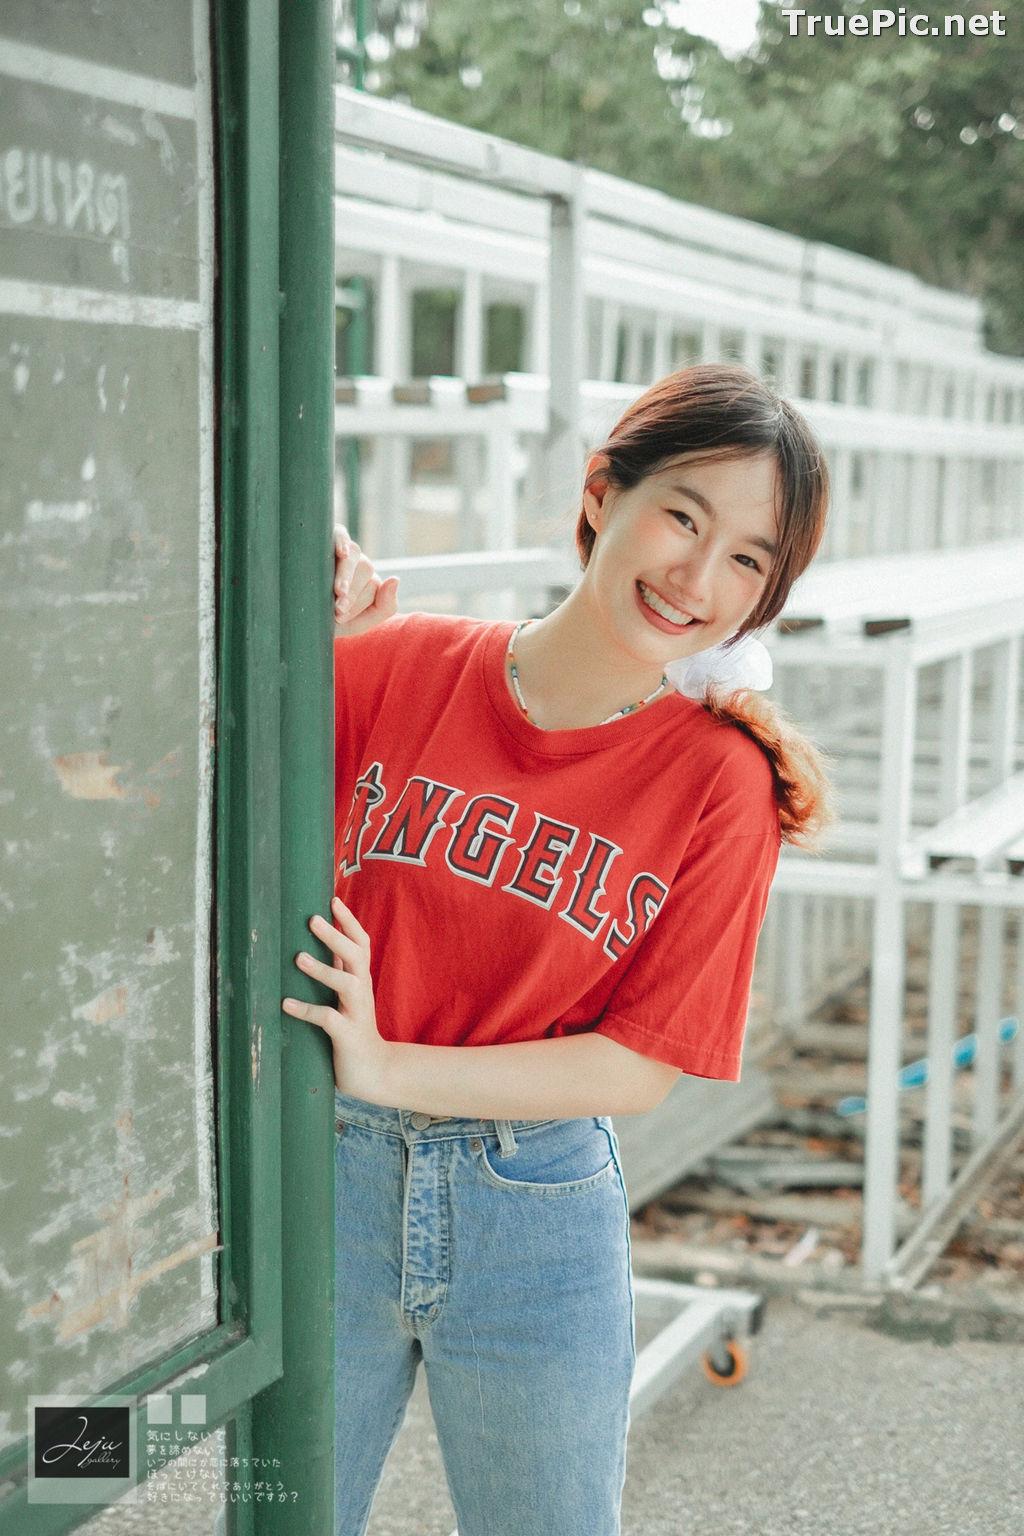 Image Thailand Cute Model - Fahfab Thunchanok - Red Angels - TruePic.net - Picture-1